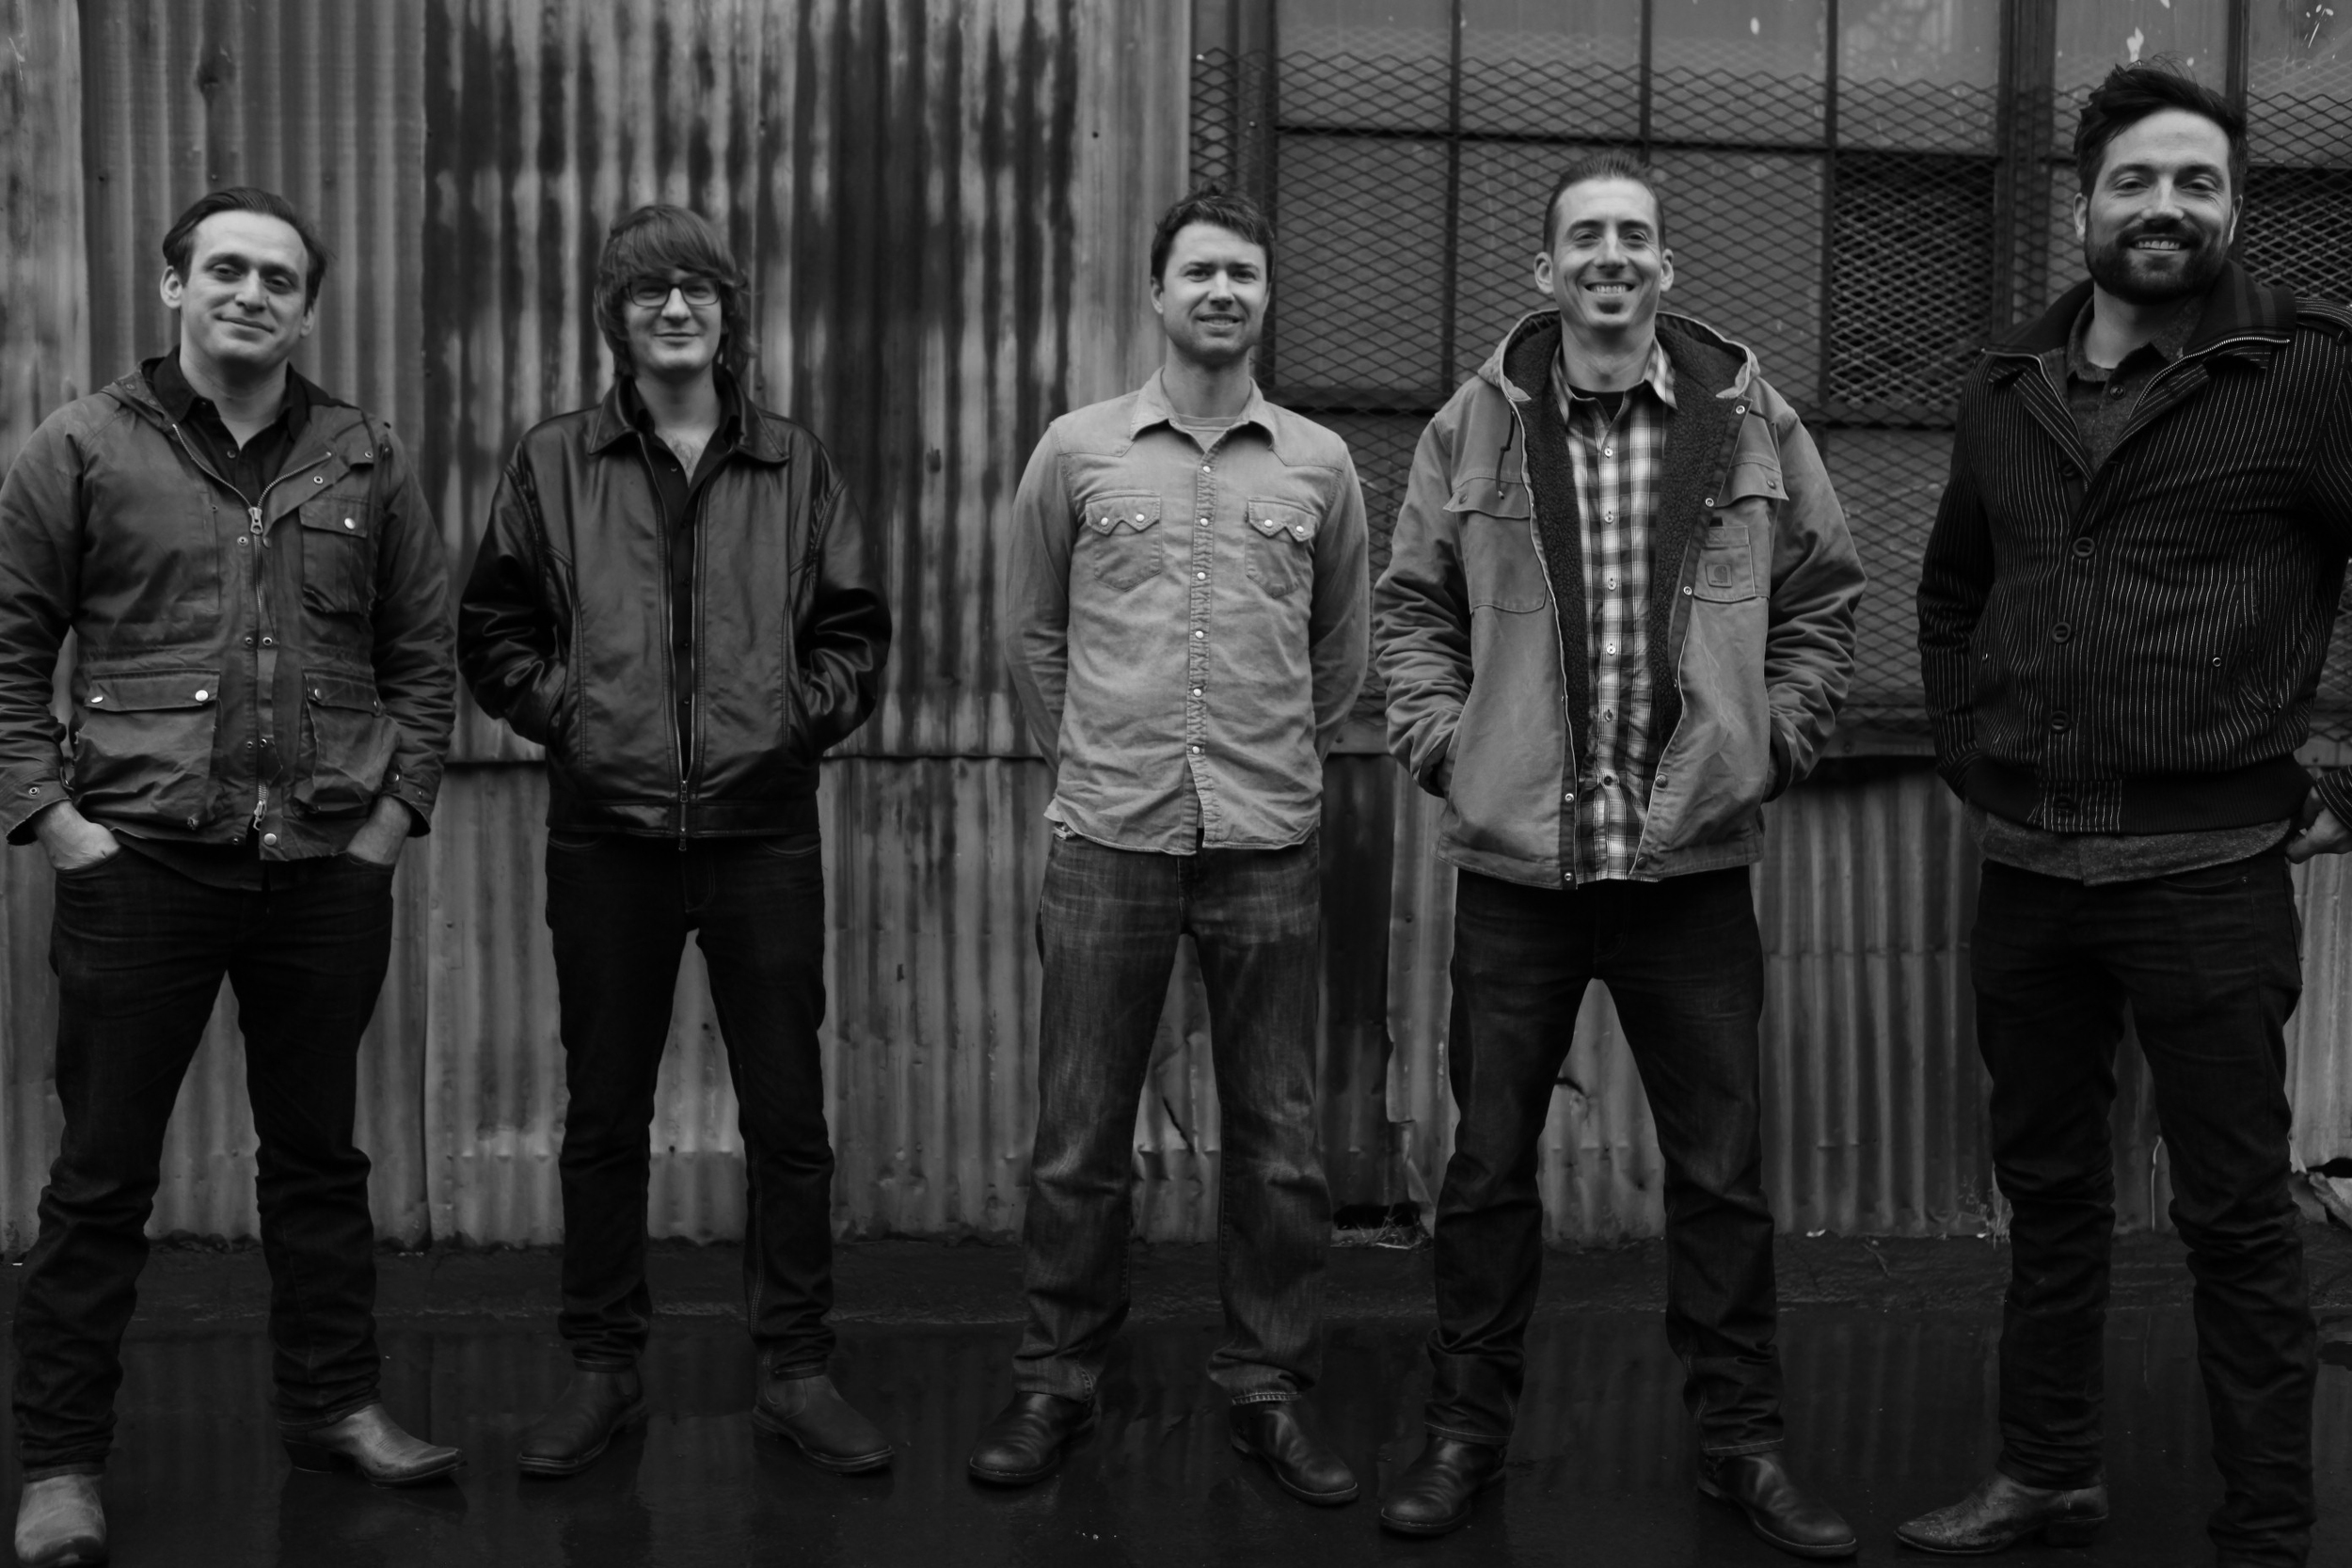 Left to right: Yoseff Tucker, Jan Purat, Andrew March, Billy Moore, Zach Sharpe.